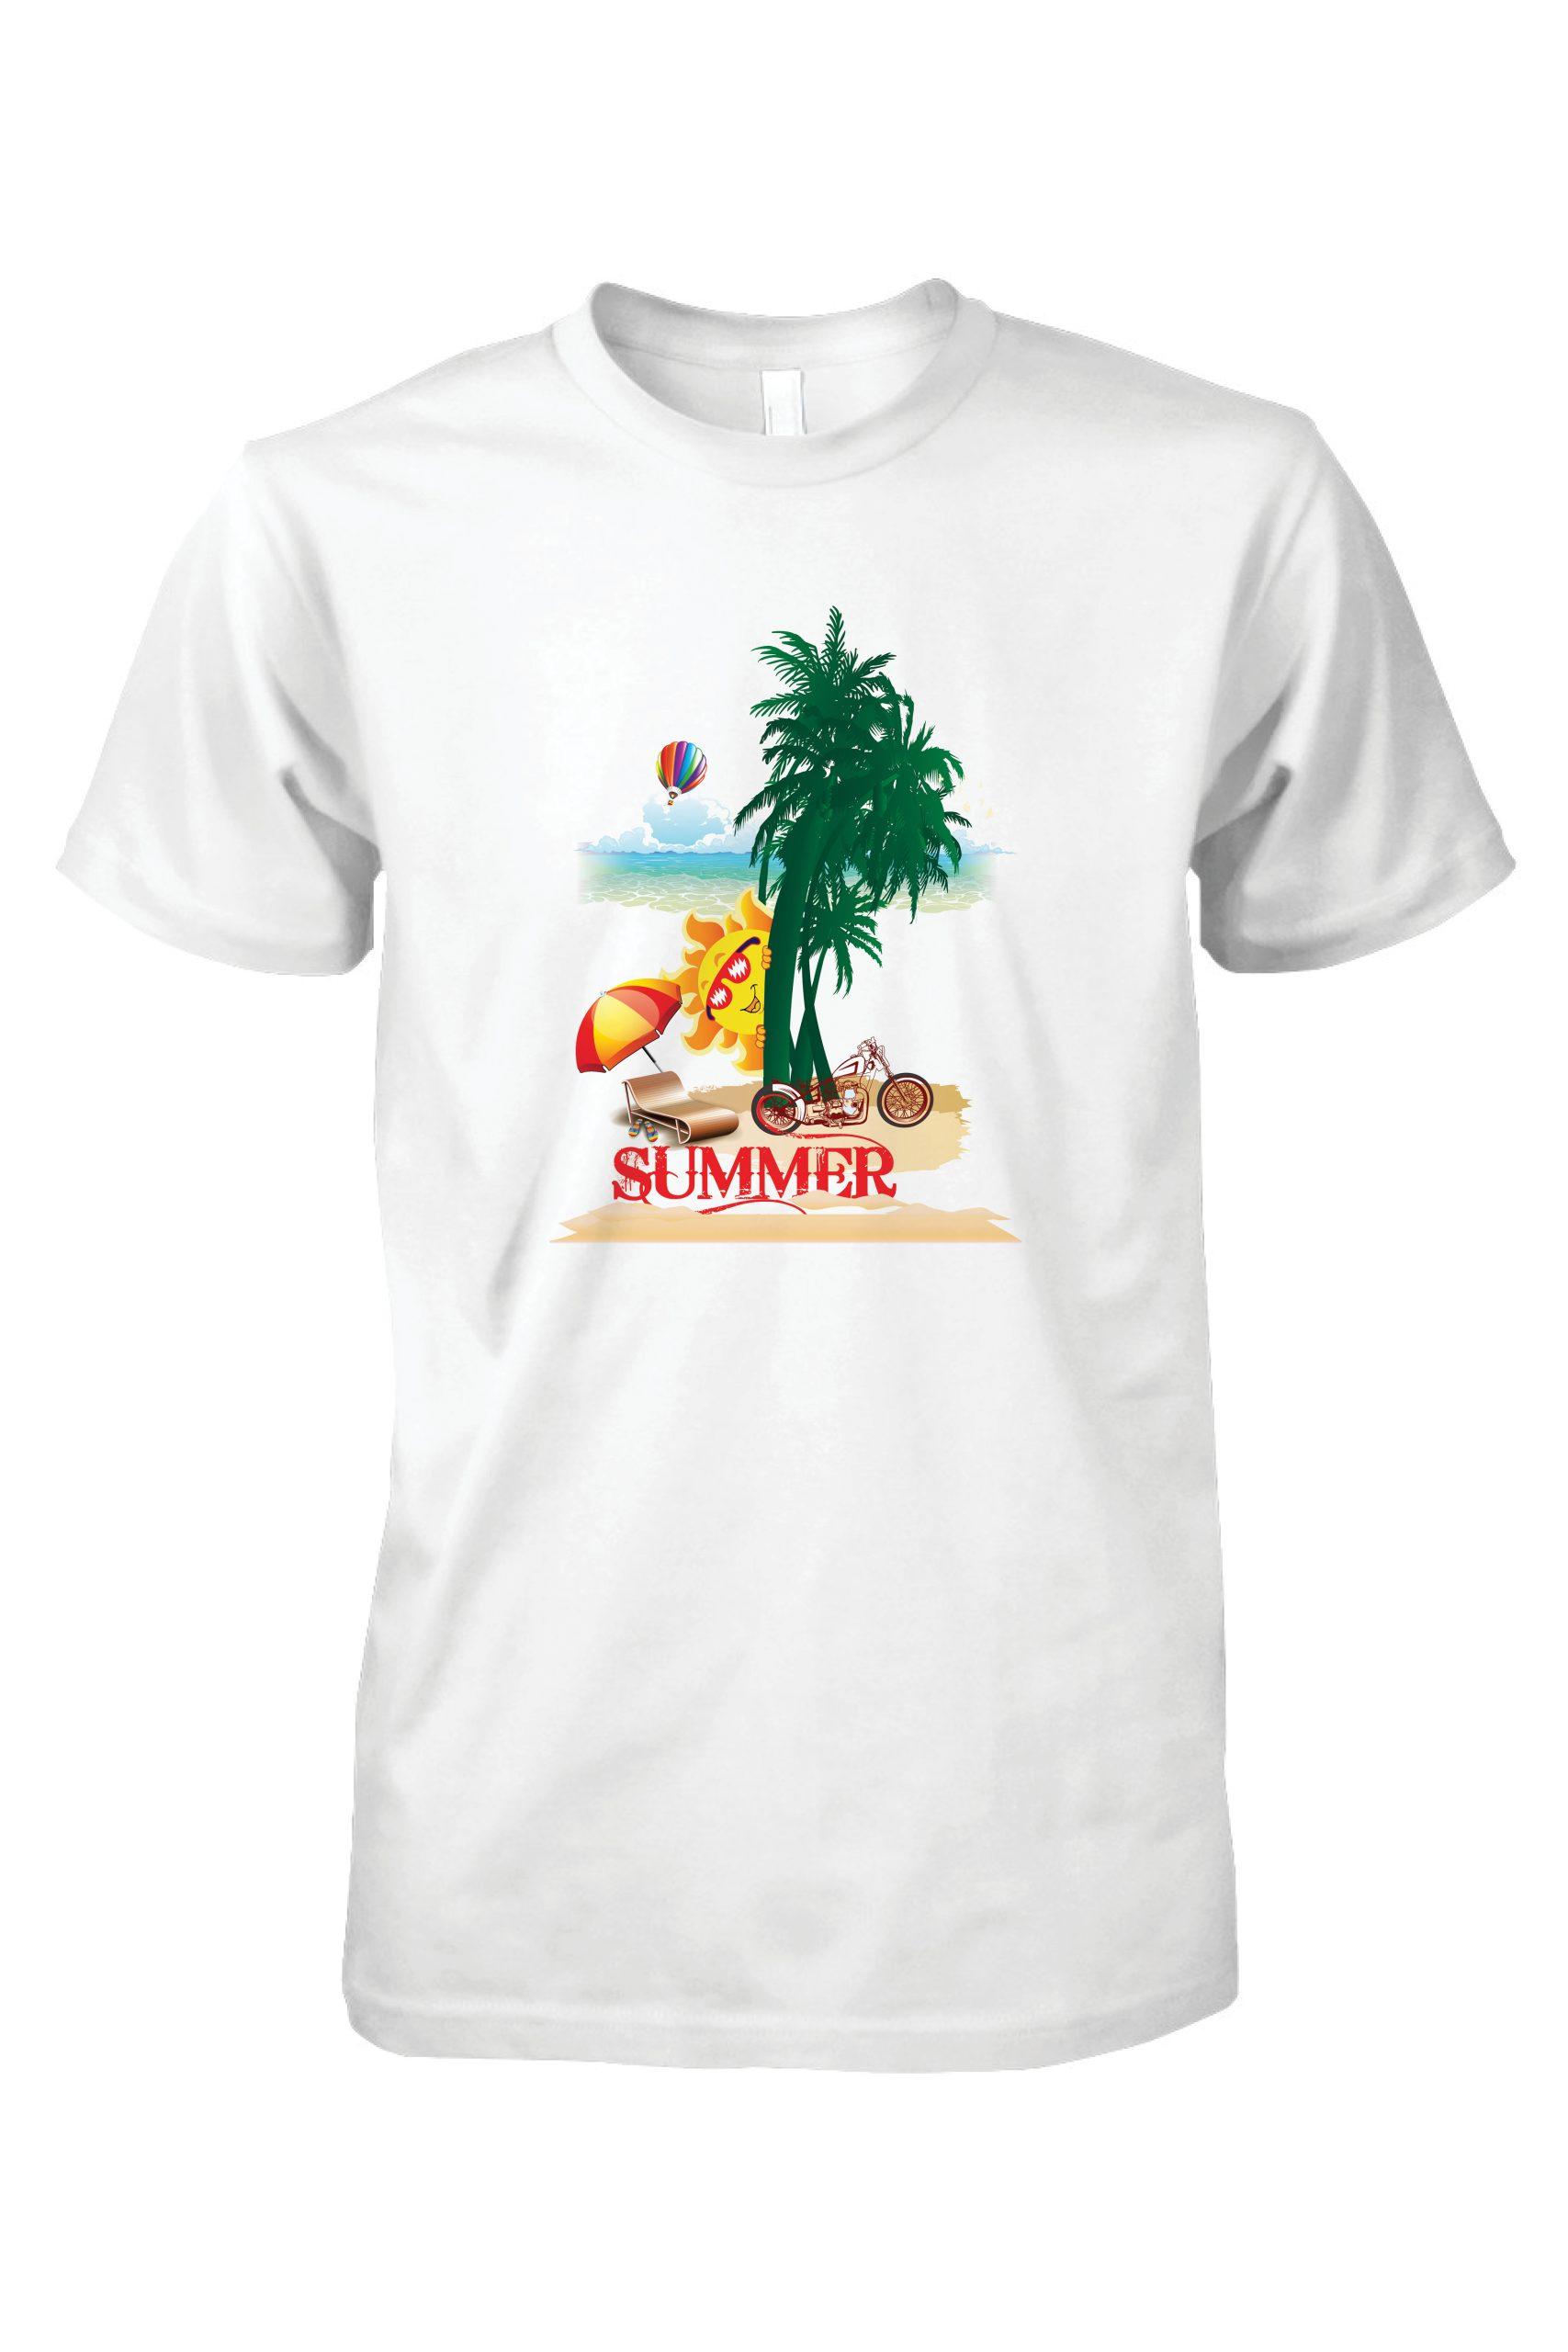 Summer T-shirts